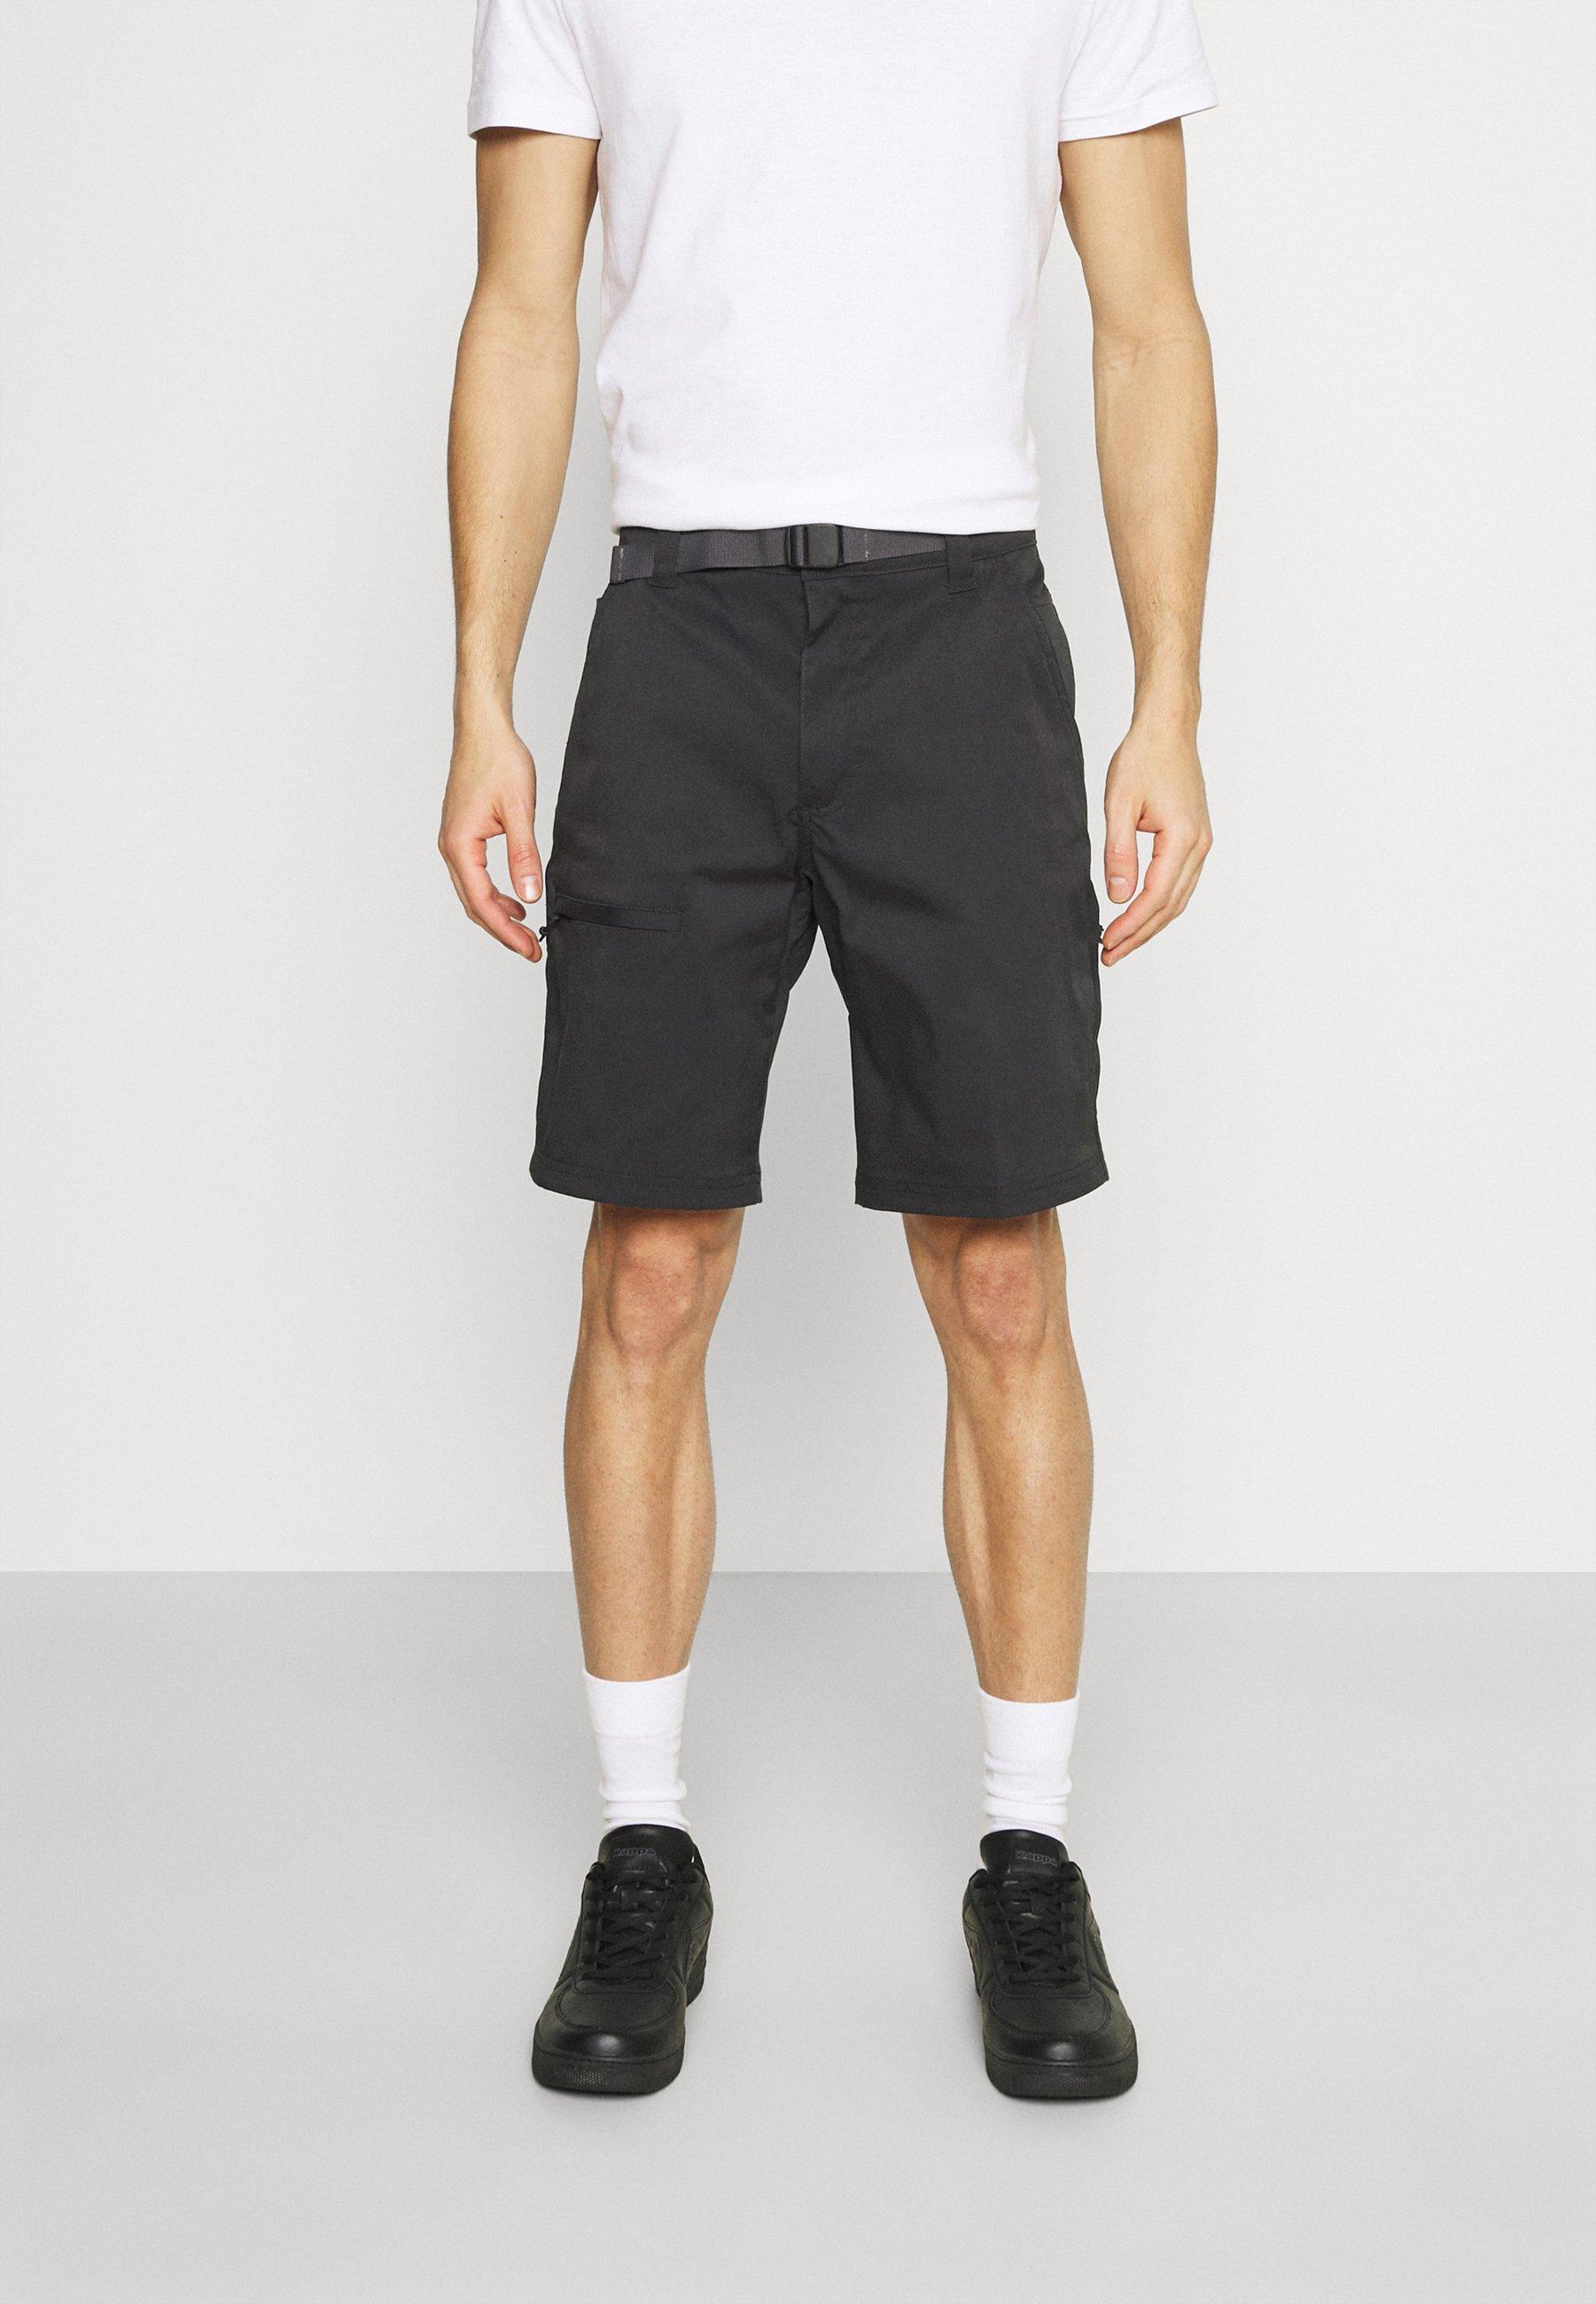 Men ALL TERRAIN GEAR BELTED - Shorts